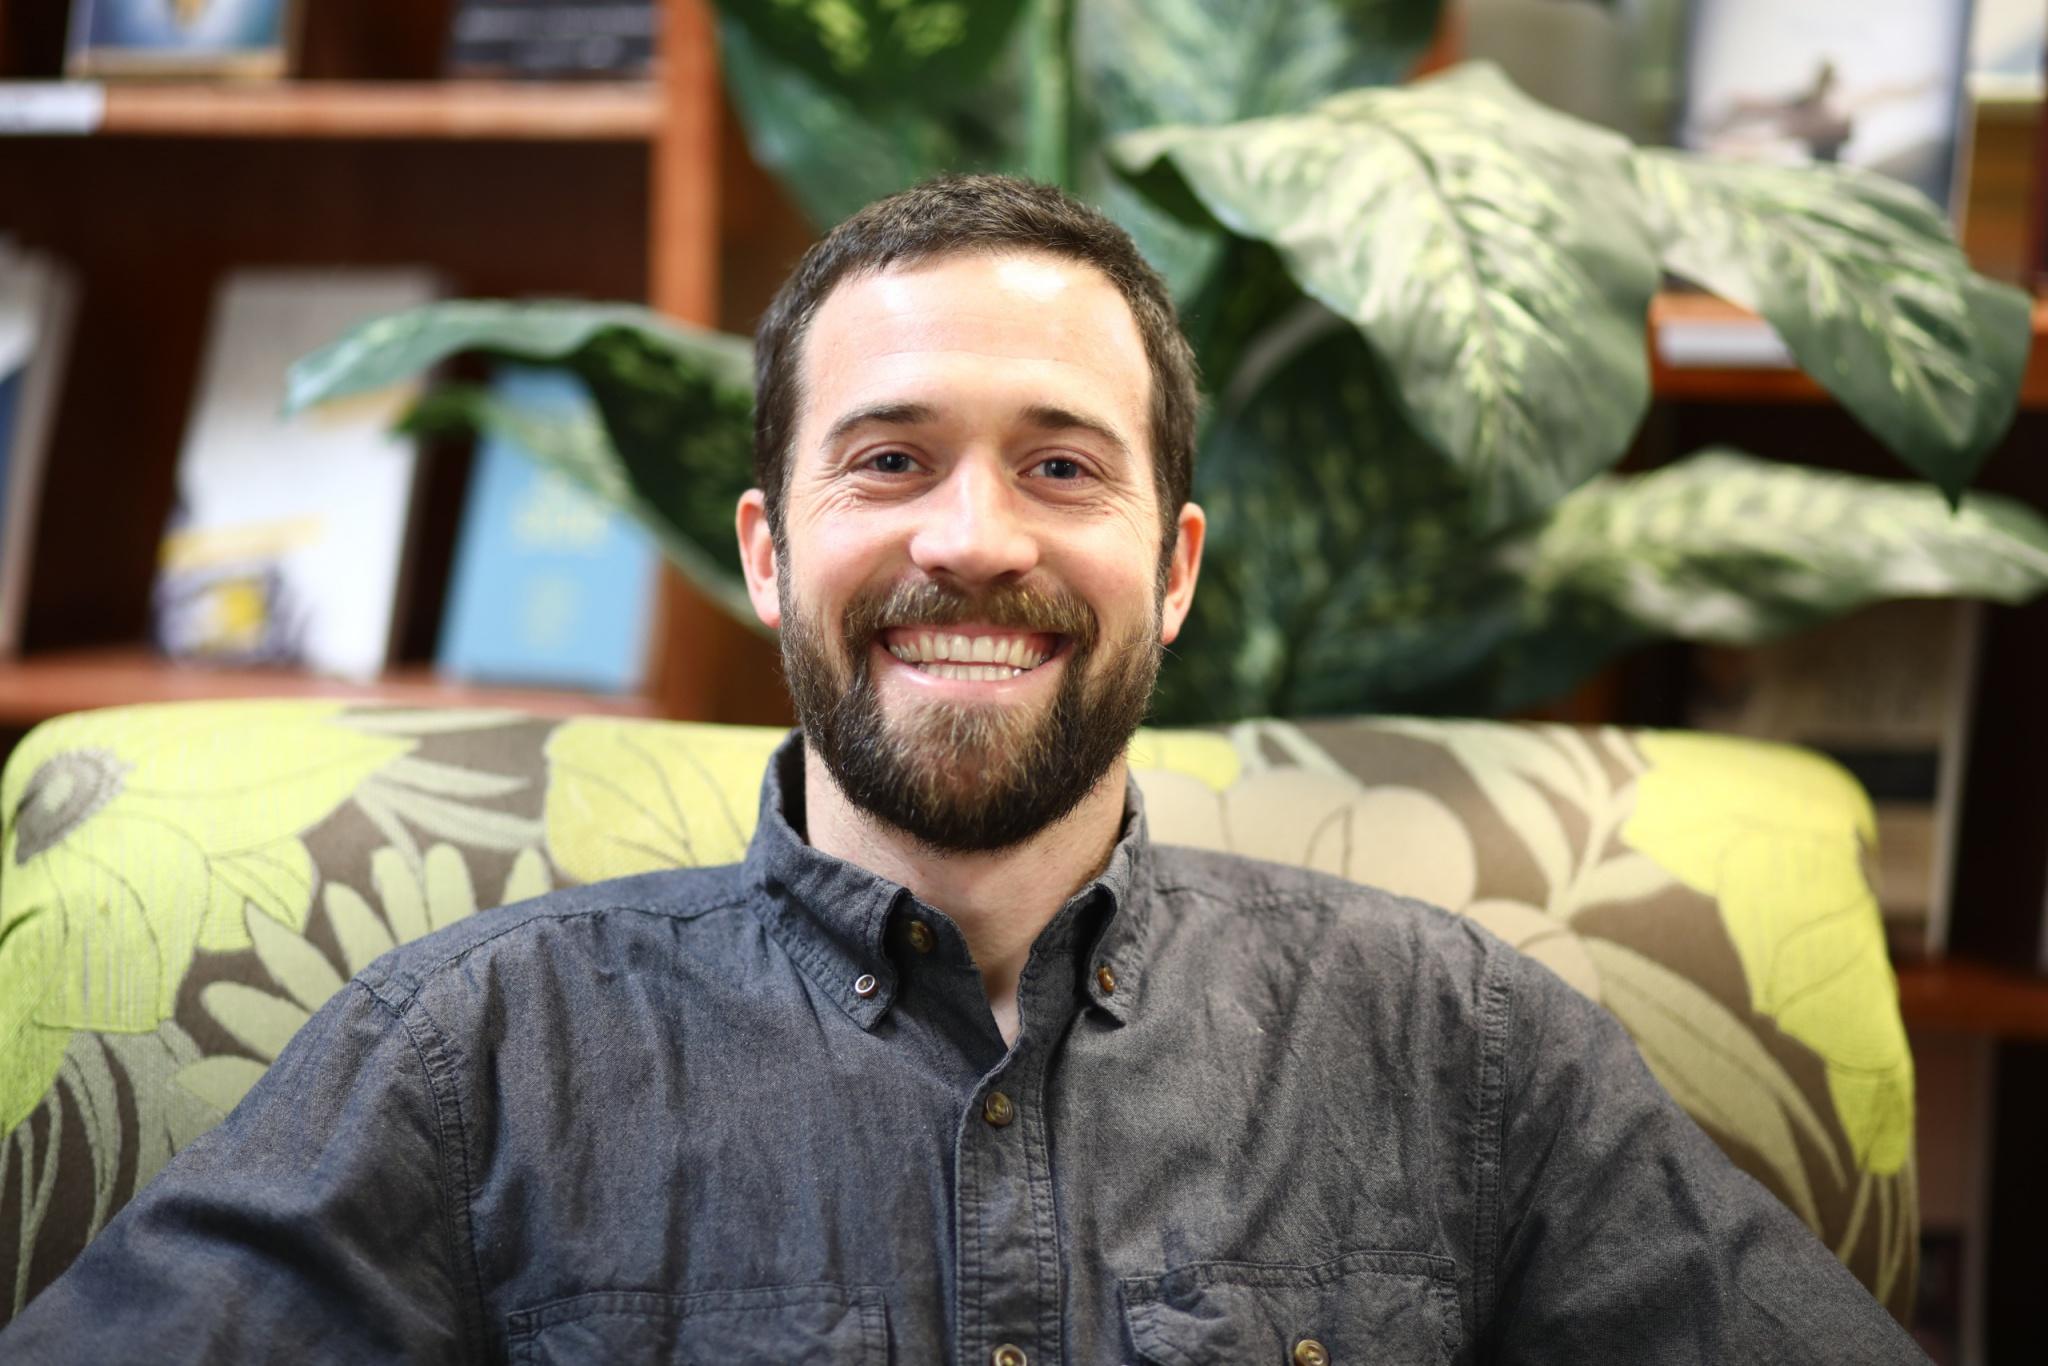 A portrait picture of Josh Edmonds in the resource center